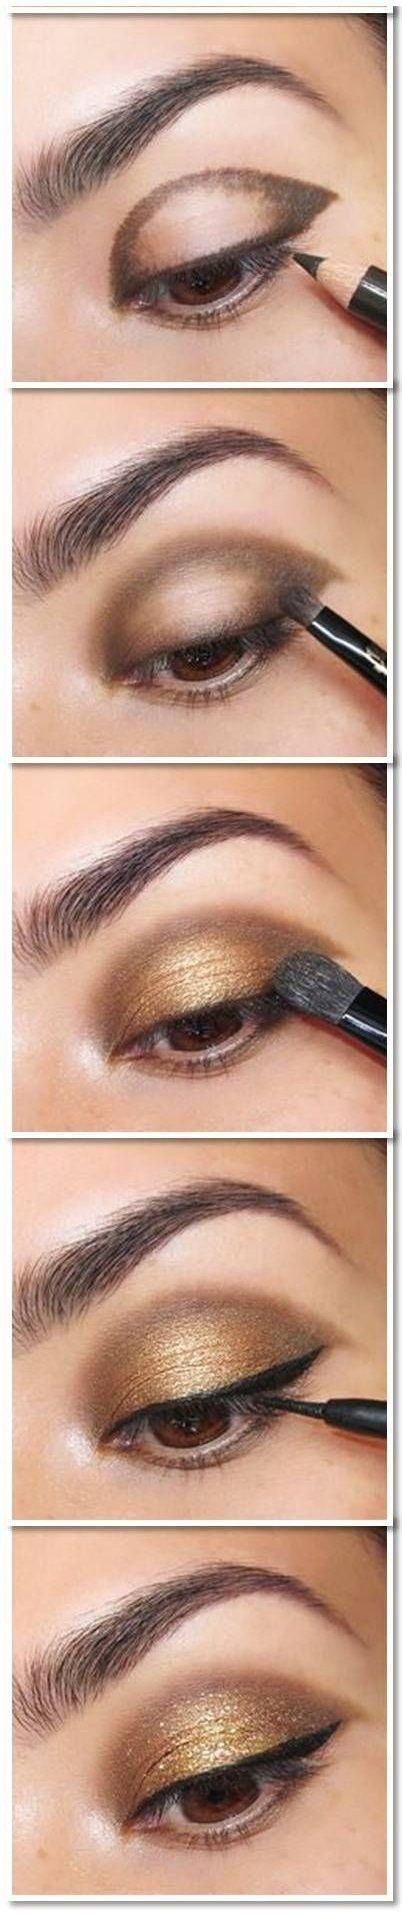 Simple Gold Eye Makeup Tutorial